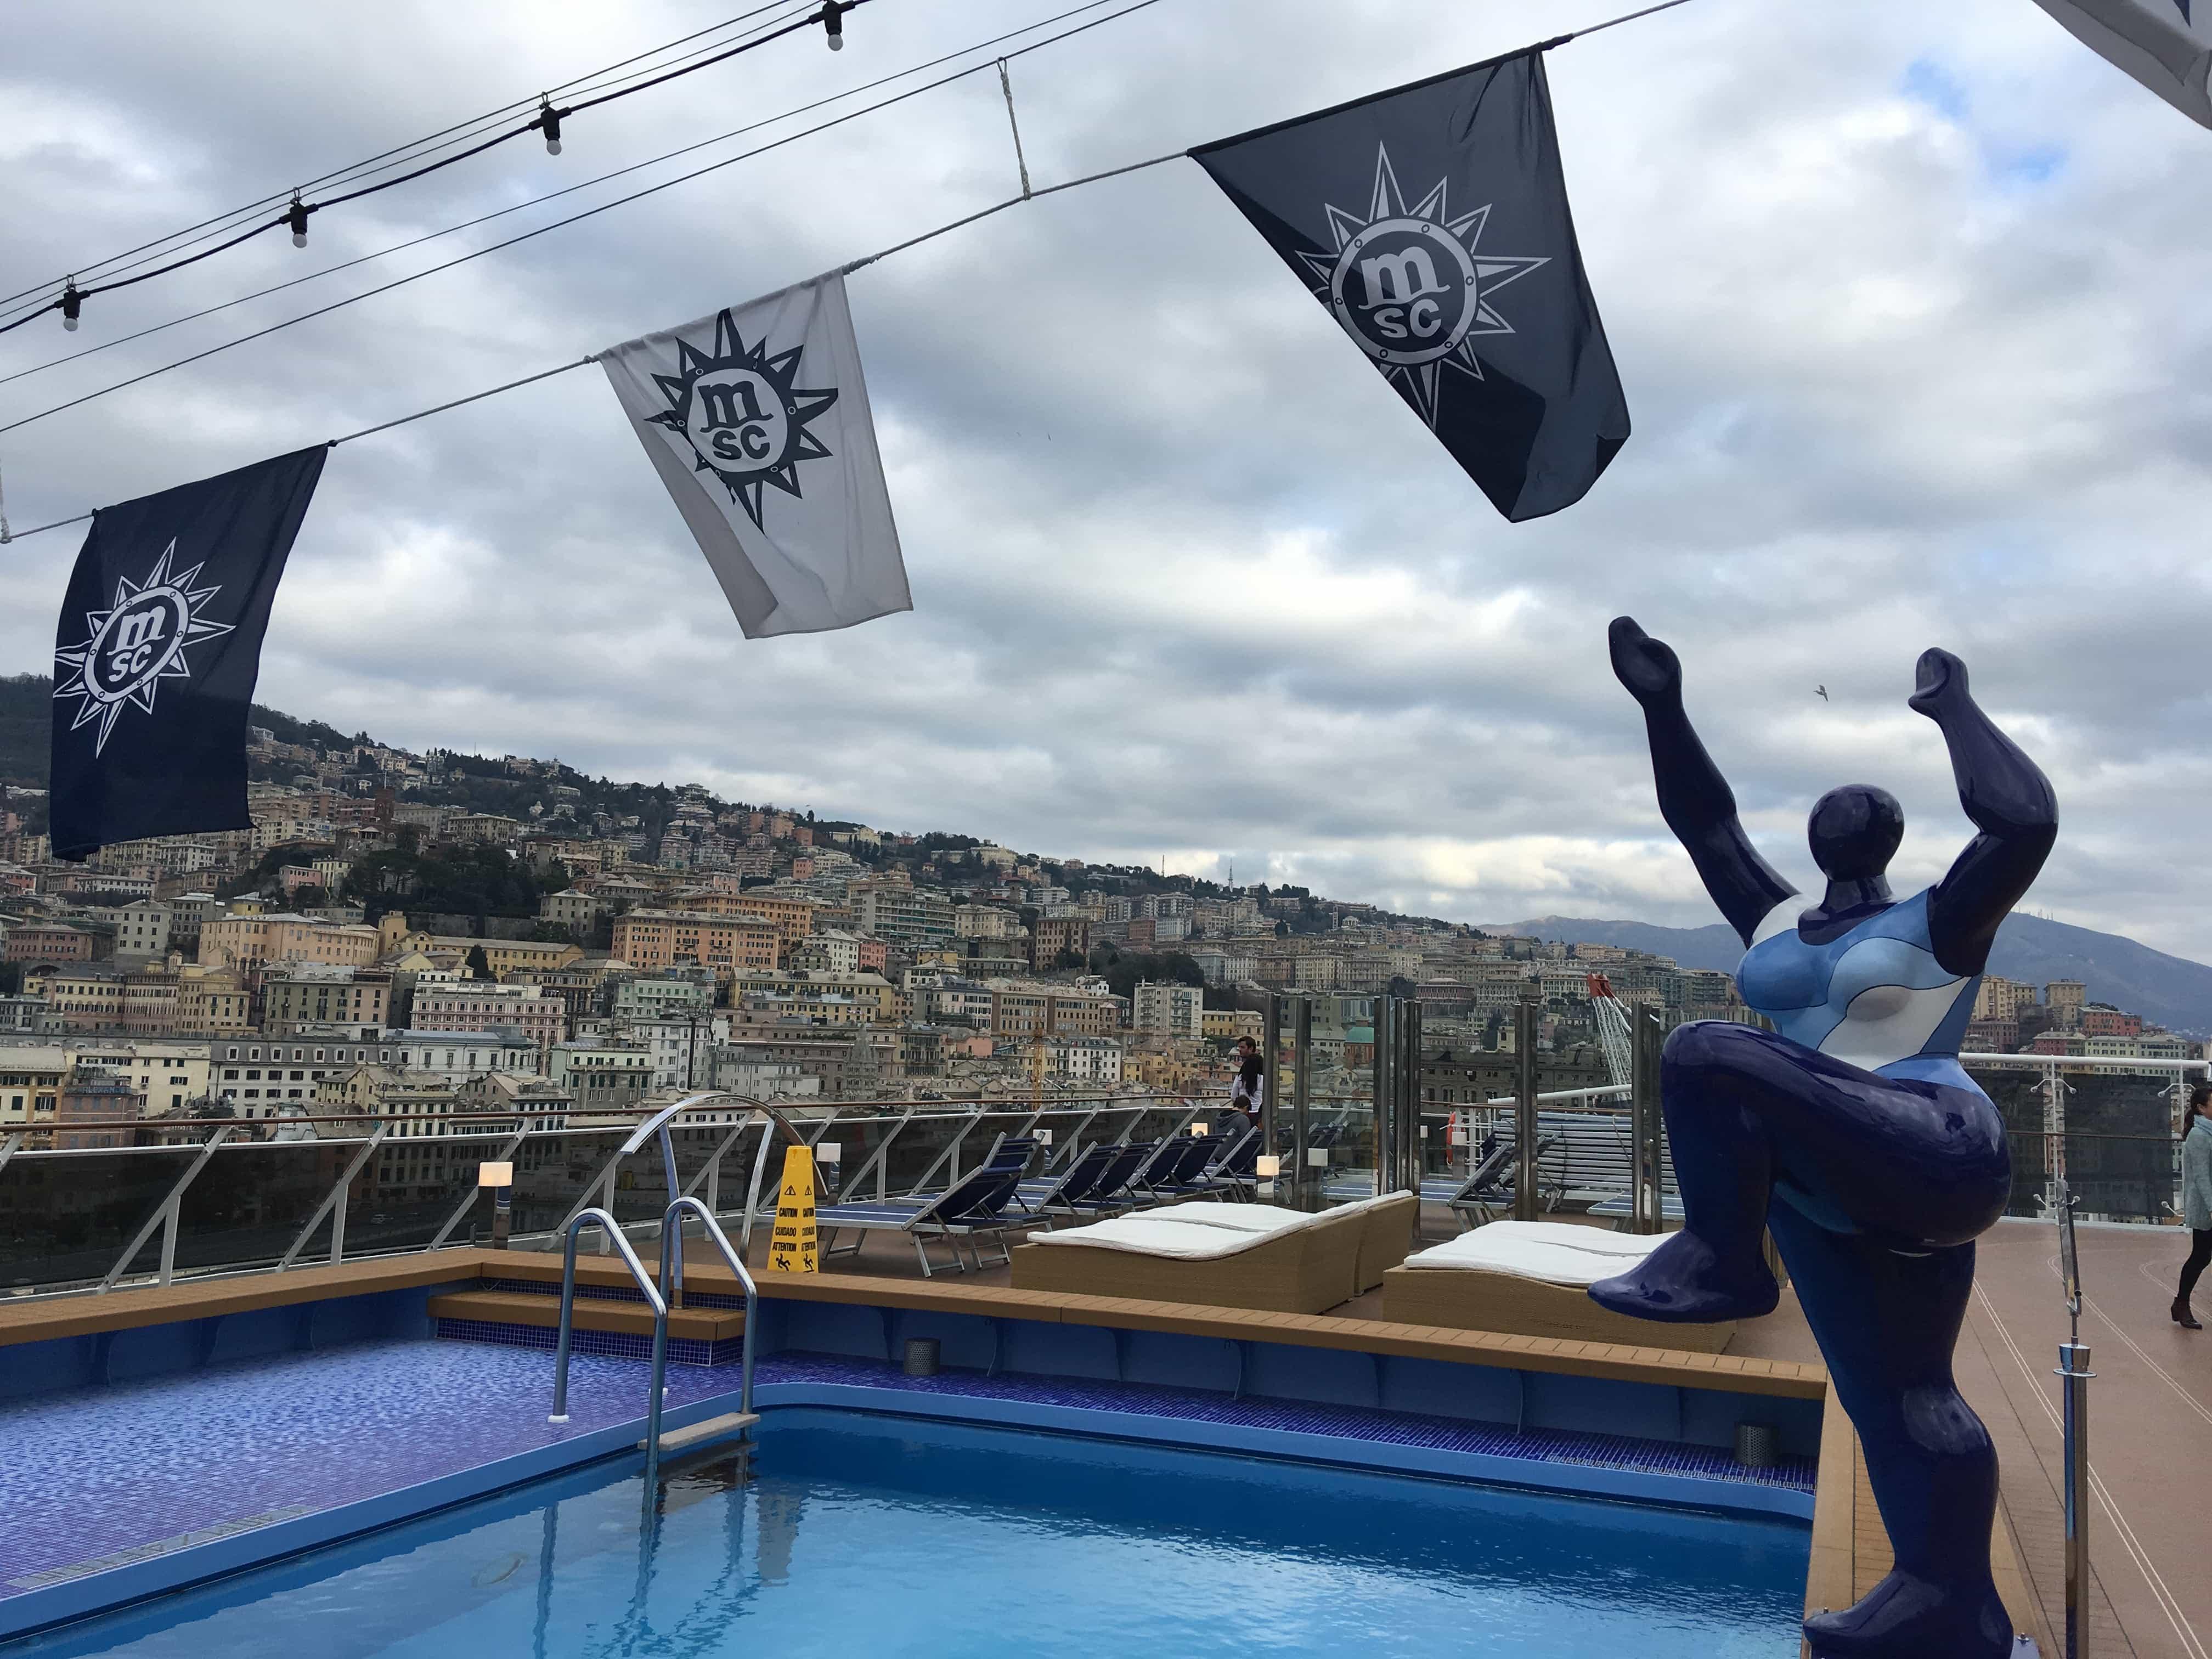 msc meraviglia aft pool sculpture flats genoa in the background